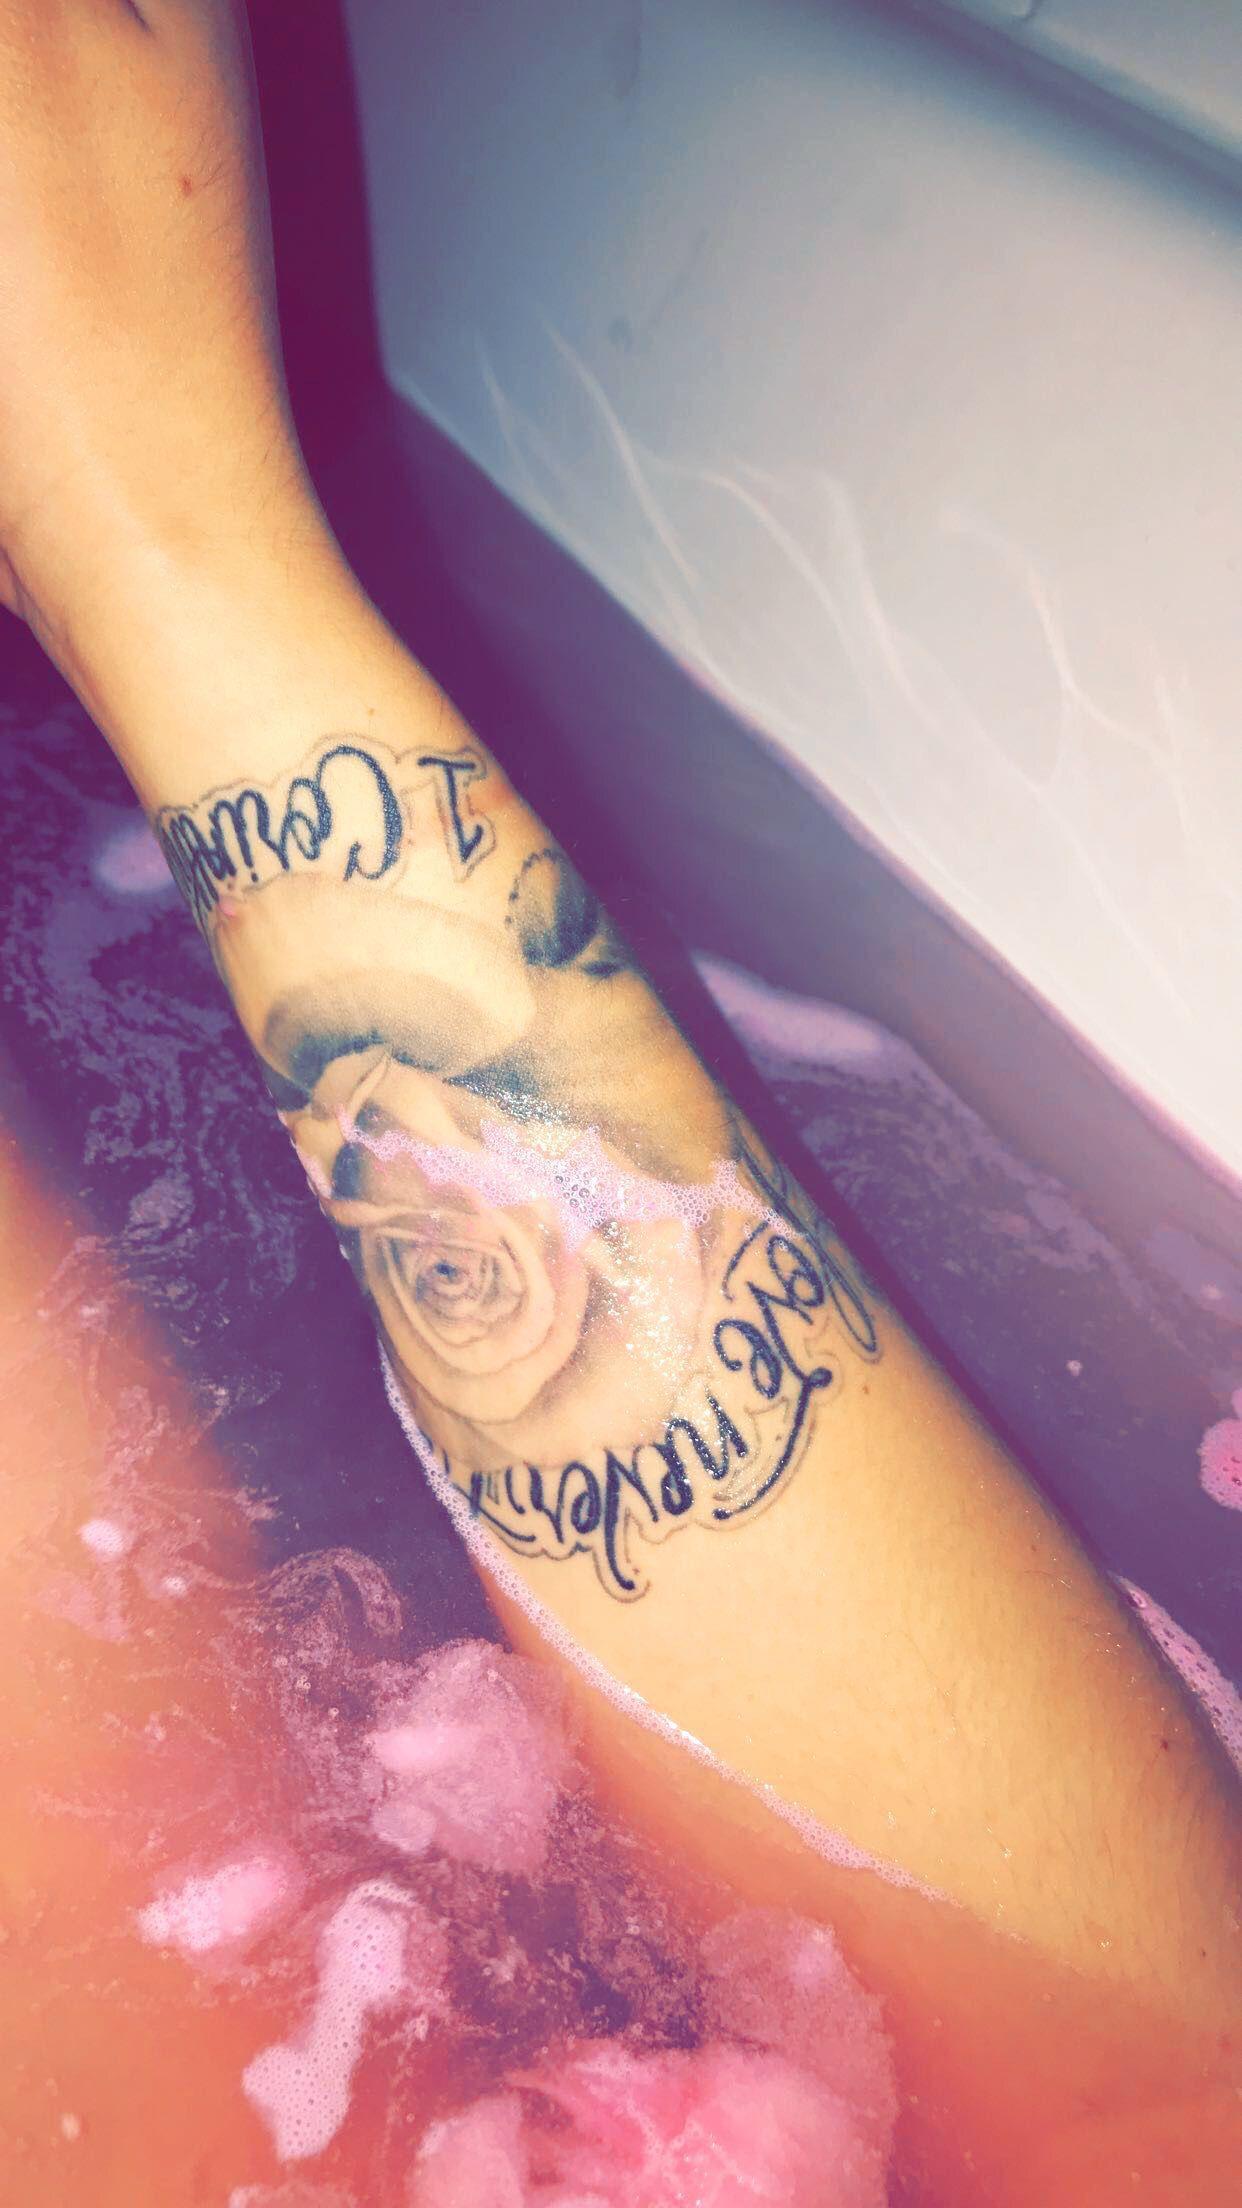 Rose tattoo love never fails Rose tattoo, Tattoos